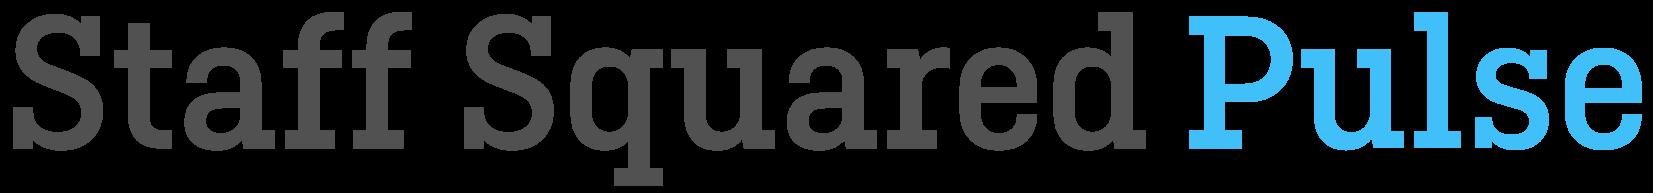 Staff Squared Pulse Logotype